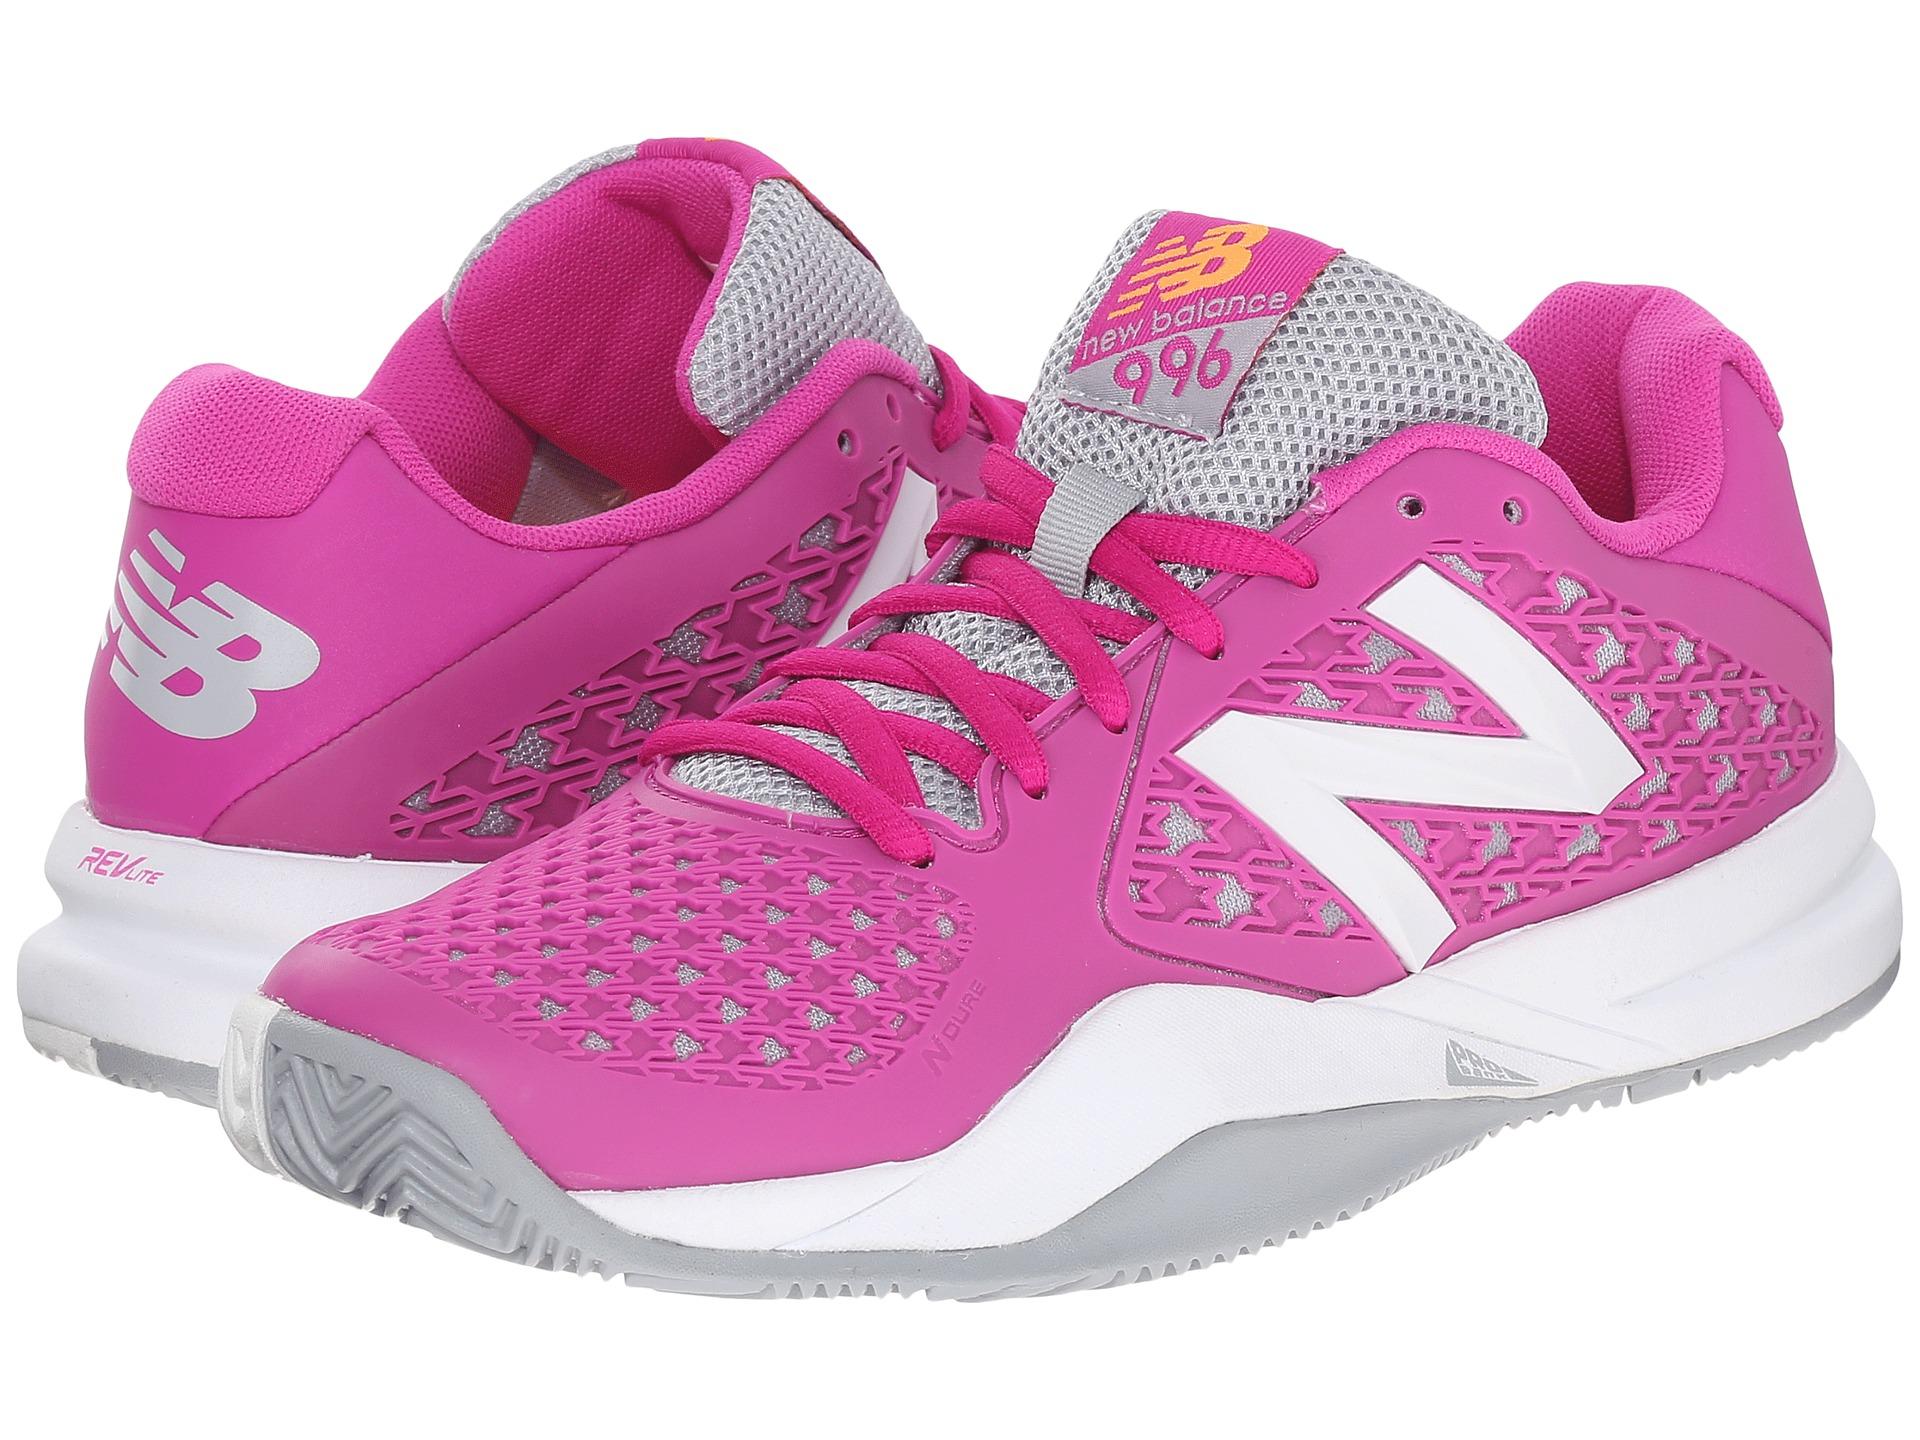 Frye Pink Tennis Shoe